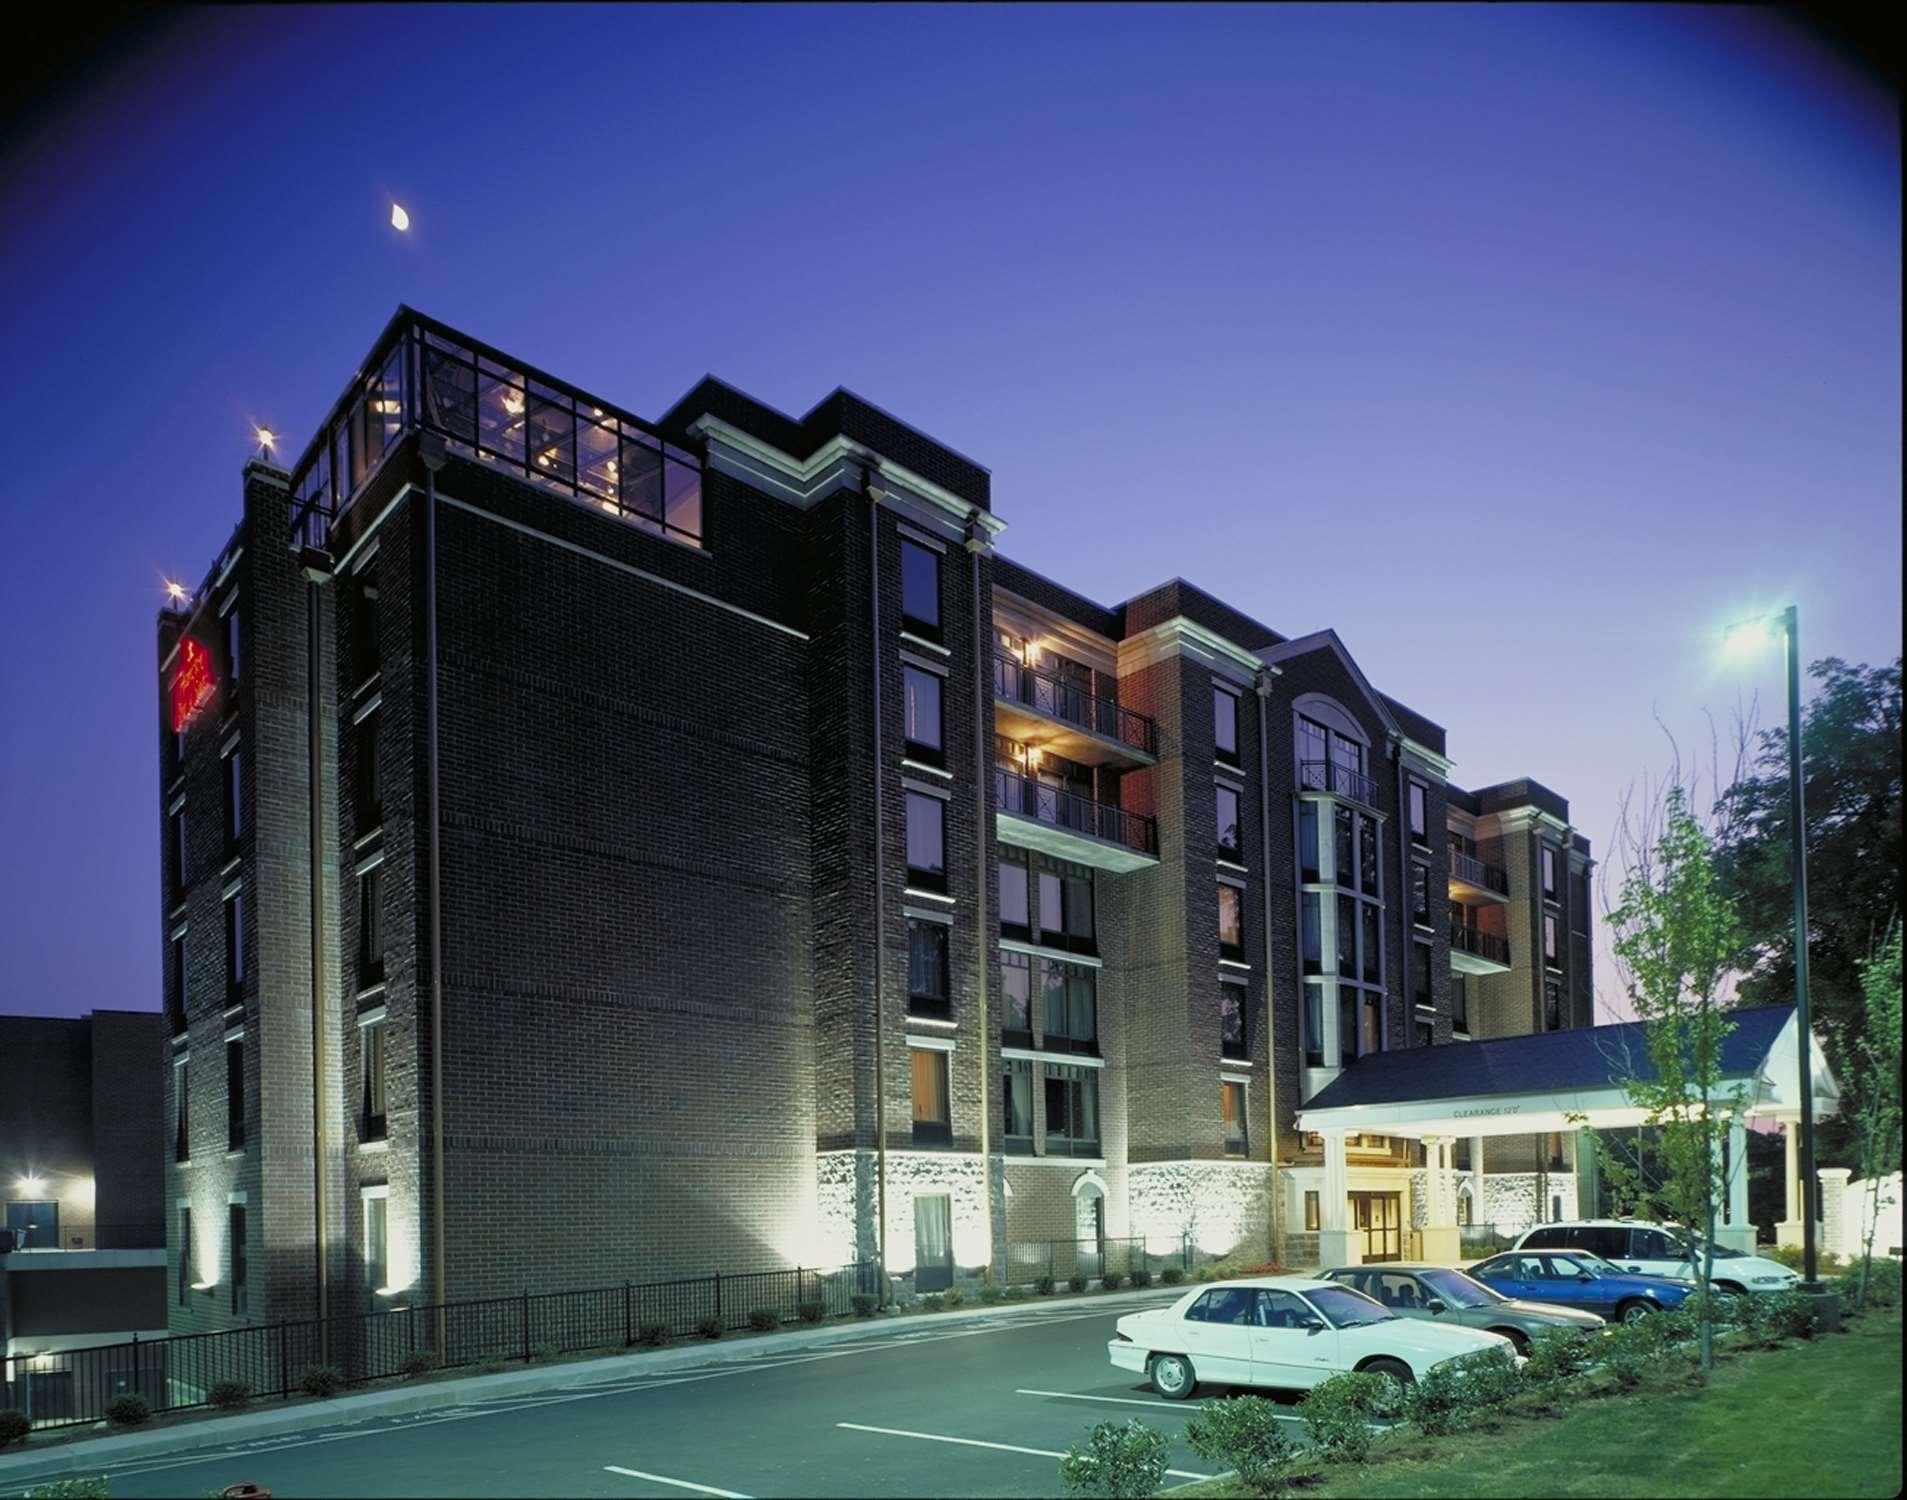 Hampton Inn & Suites Nashville-Green Hills image 1